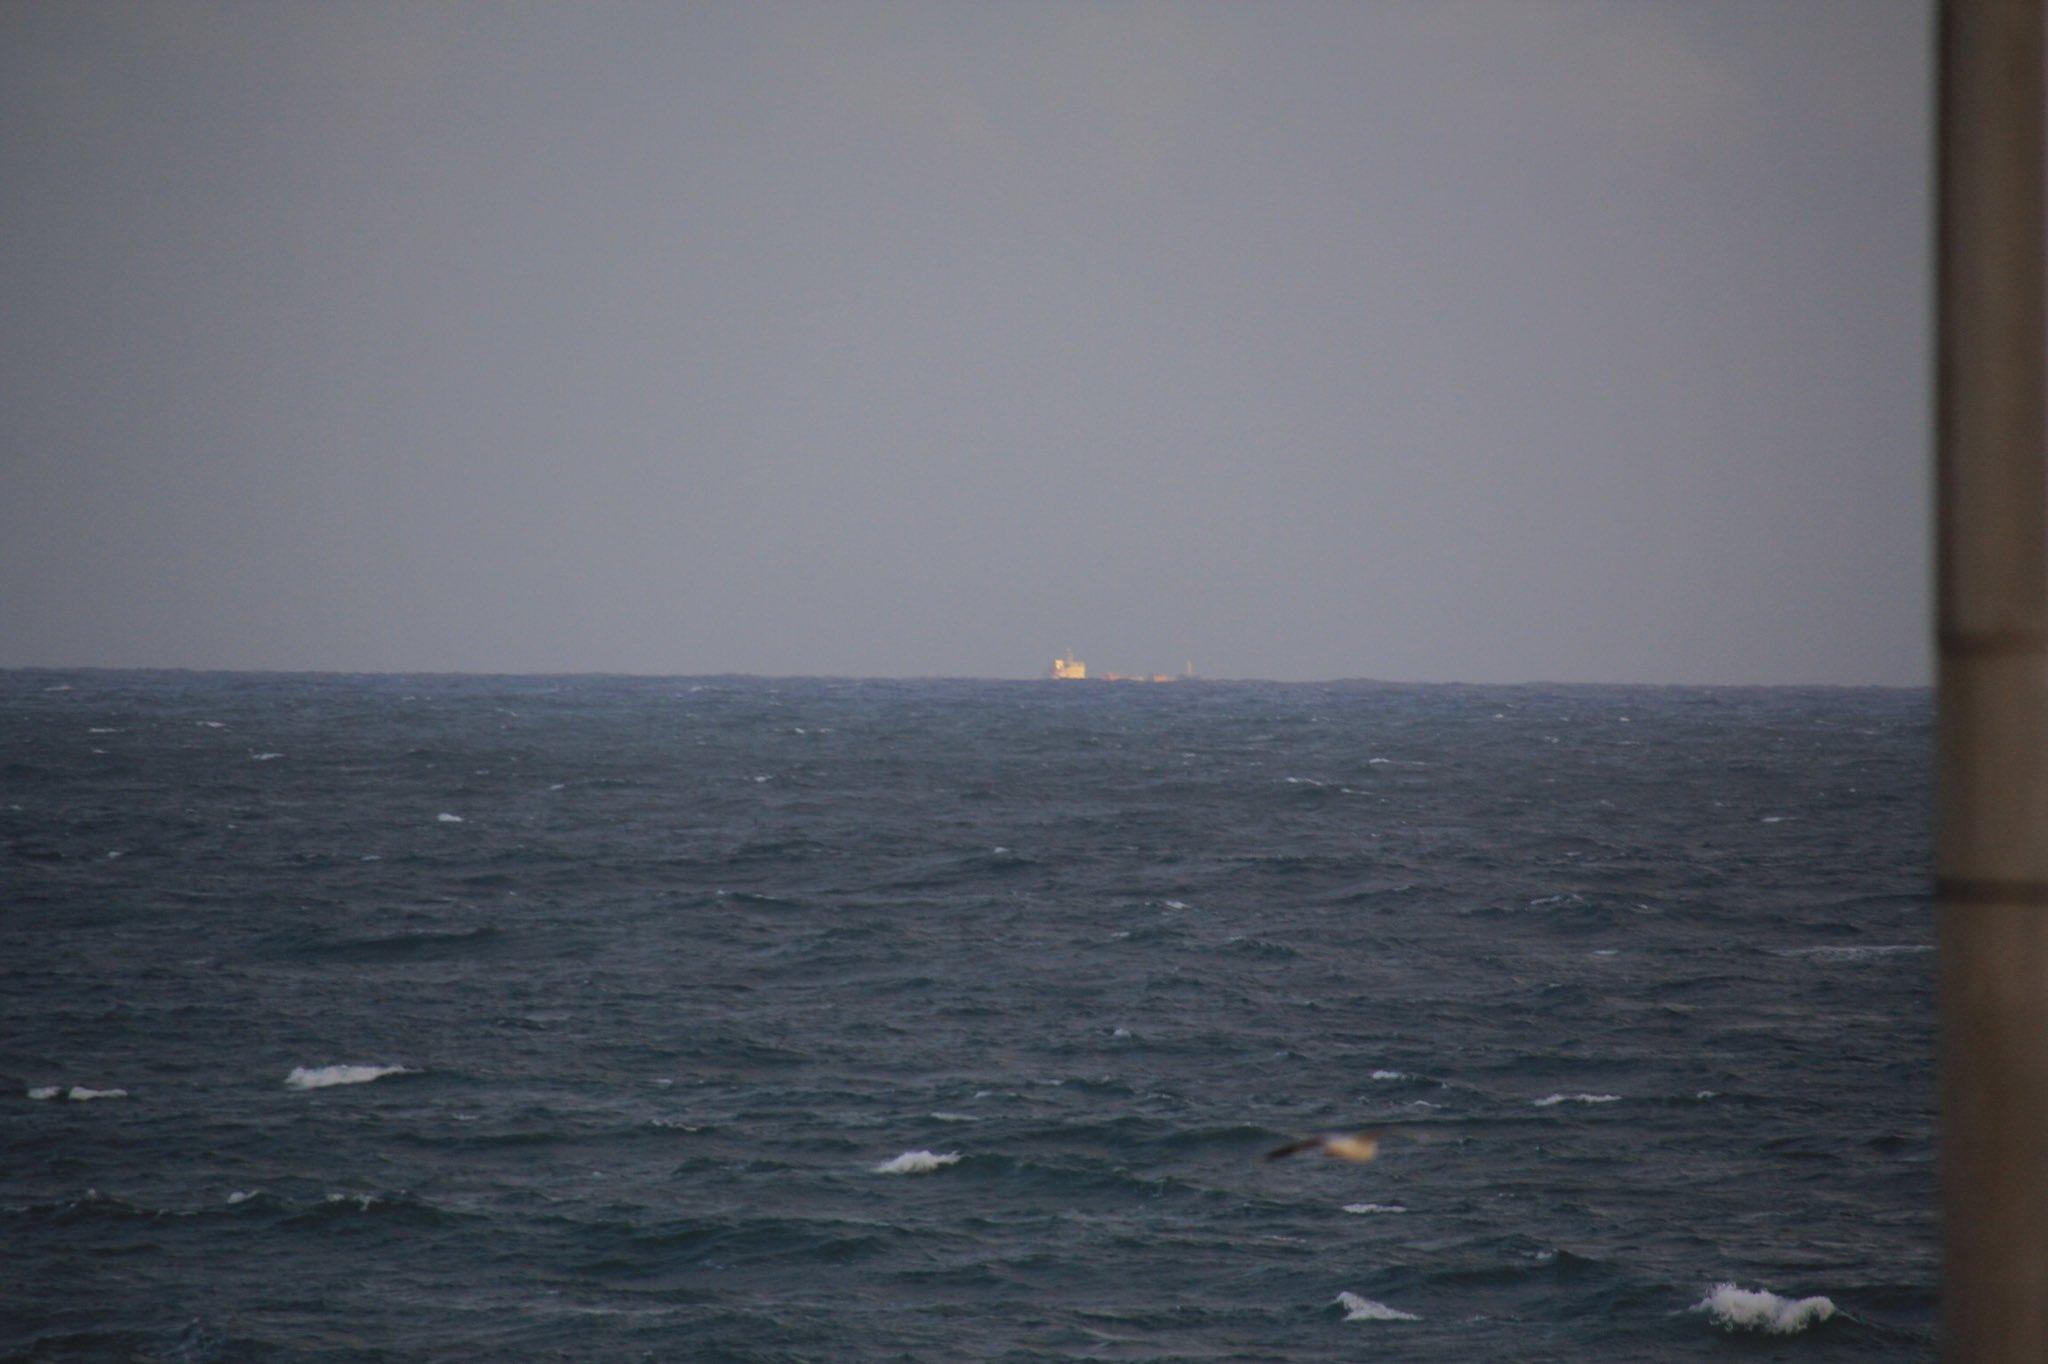 @nieveszapatapic @UnCastellsMes @nicolassteno11 @TecnoXplora @astro_duque Se hunde el barco SOS https://t.co/AGqulMaJW5